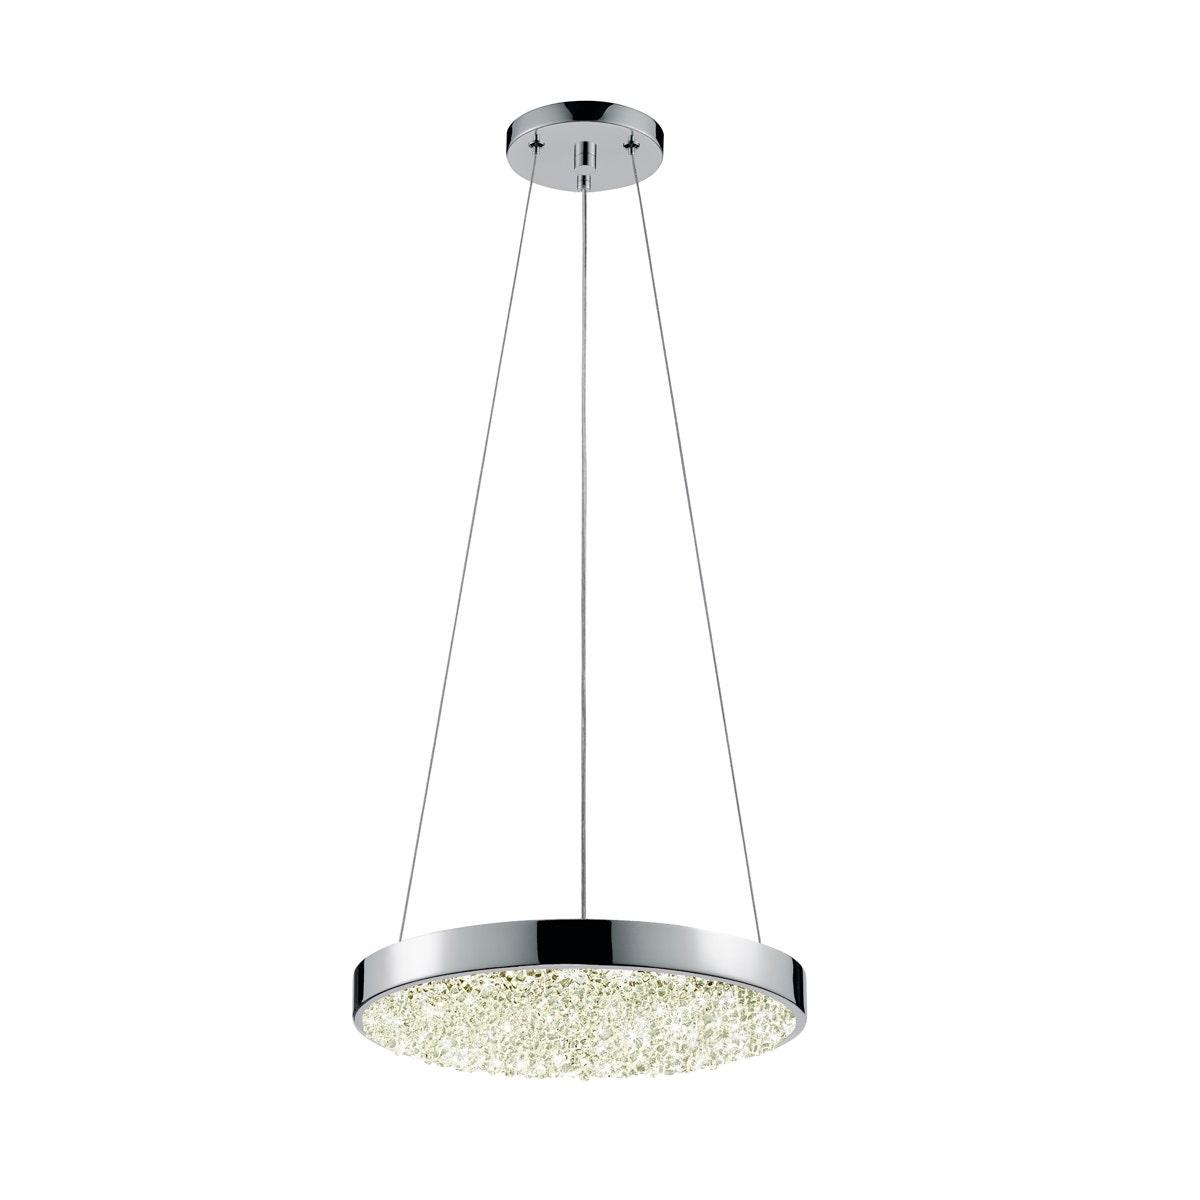 sonneman Dazzle LED Pendant dining room